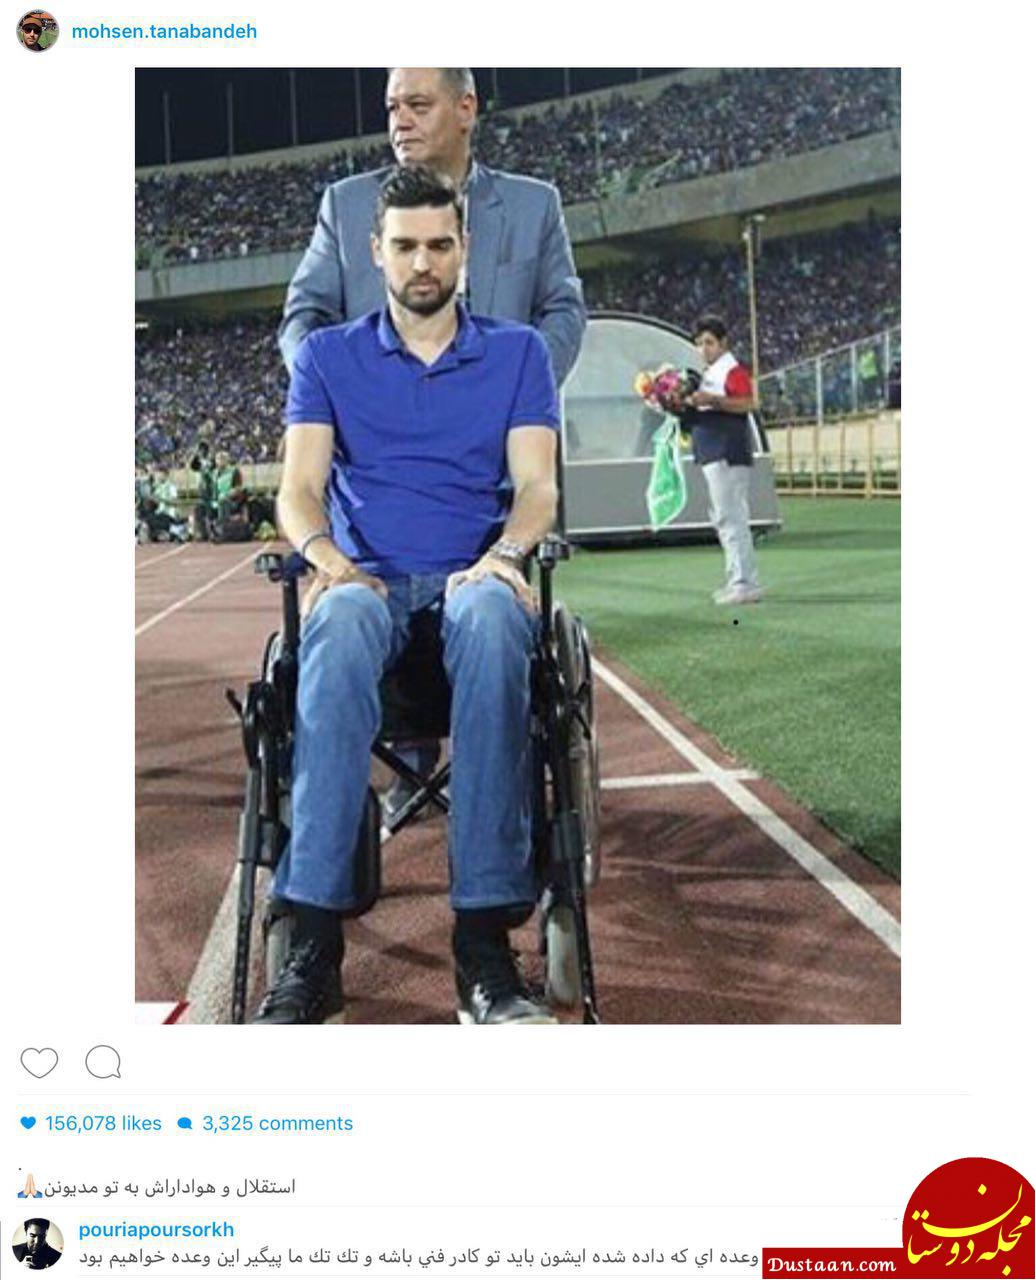 www.dustaan.com پست اینستاگرامی محسن تنابنده برای بازیکن مصدوم استقلال +عکس